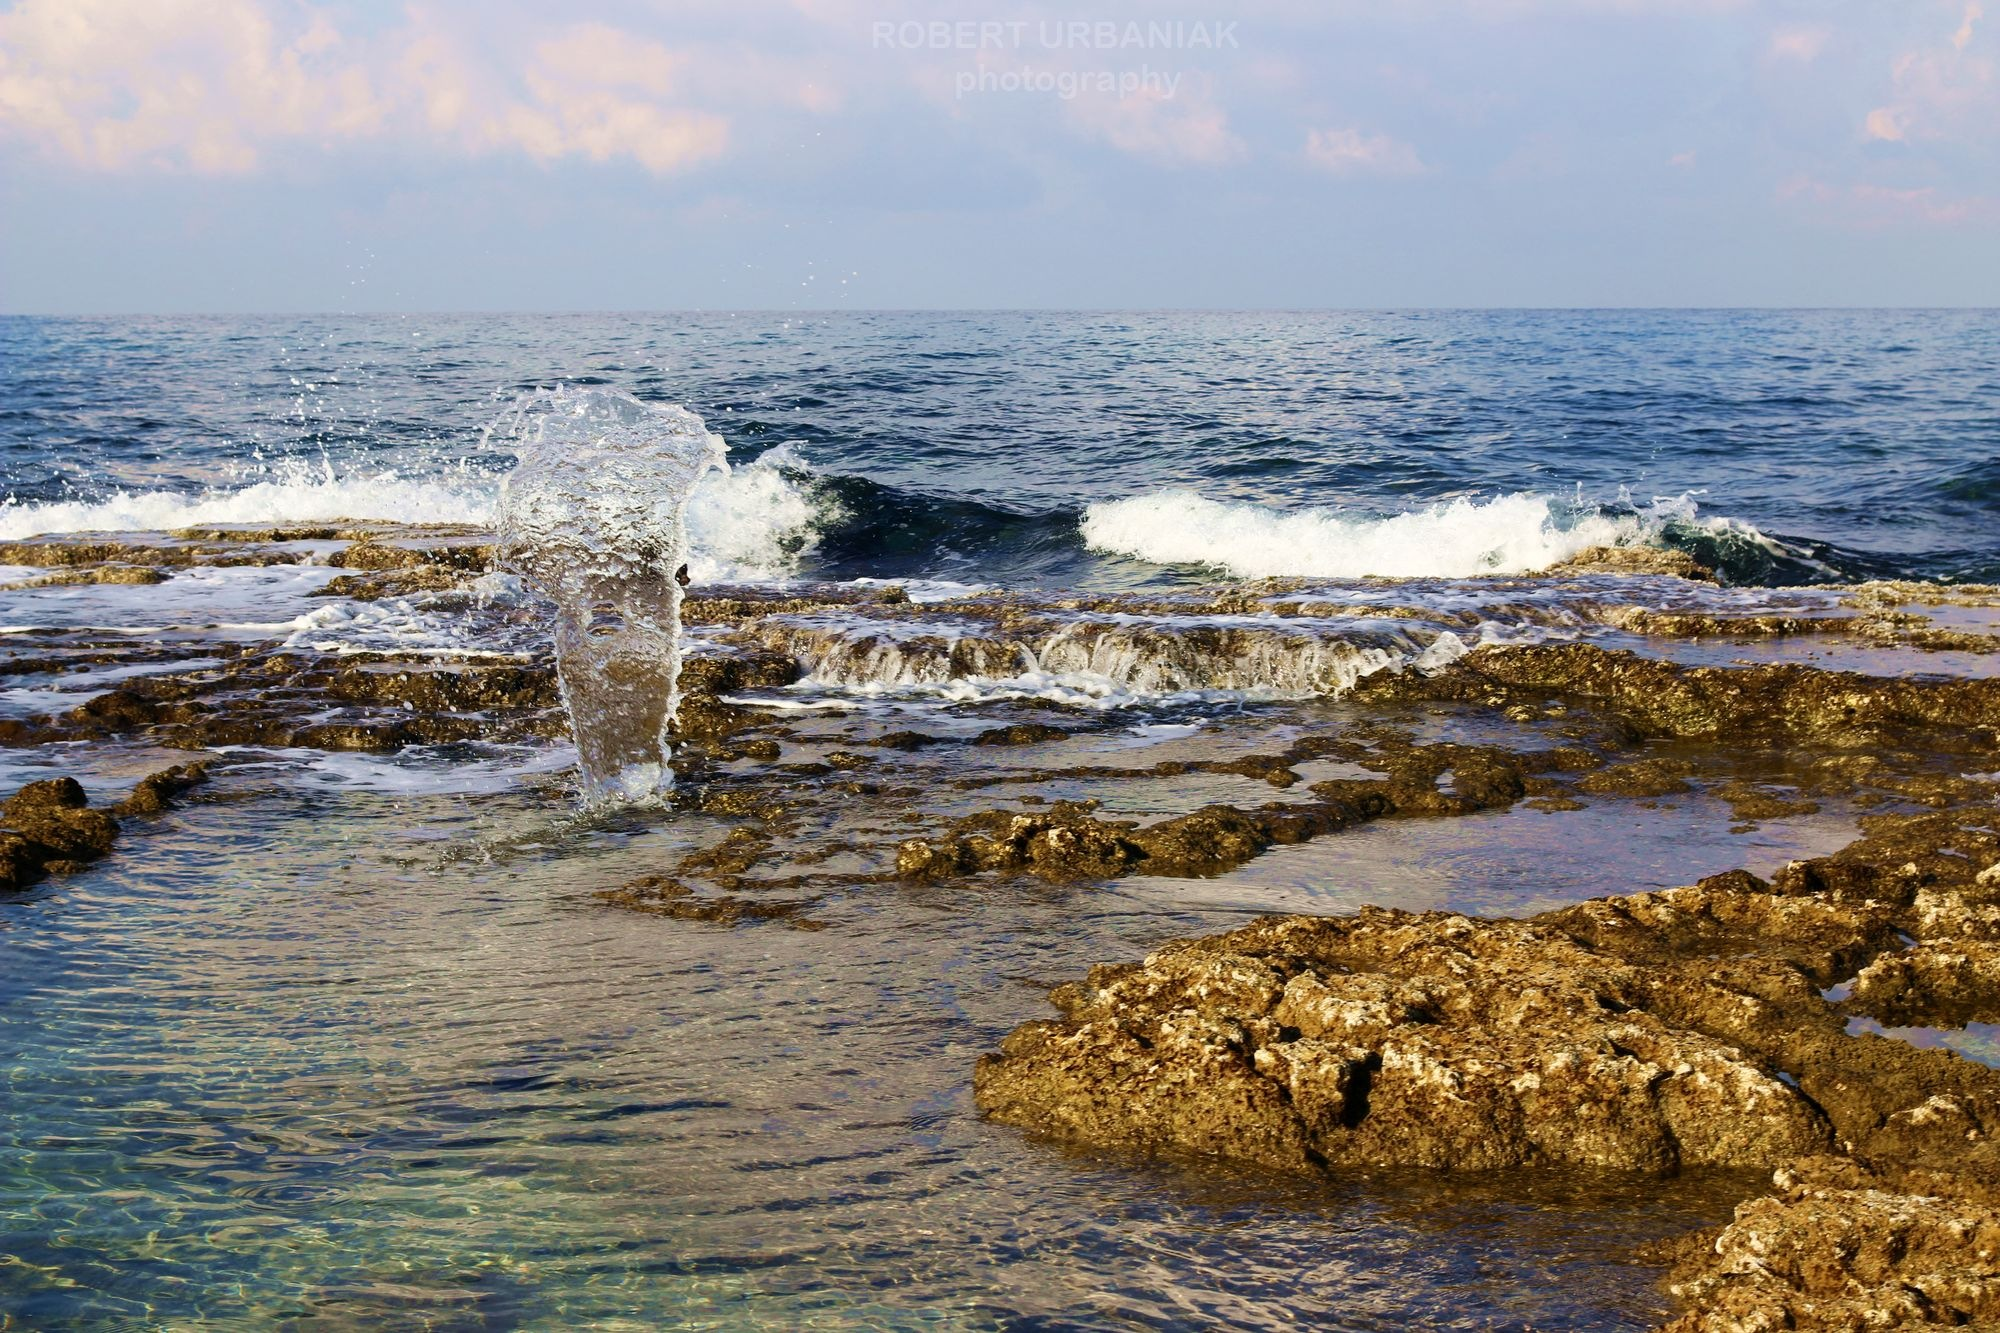 splash by Robert Urbaniak